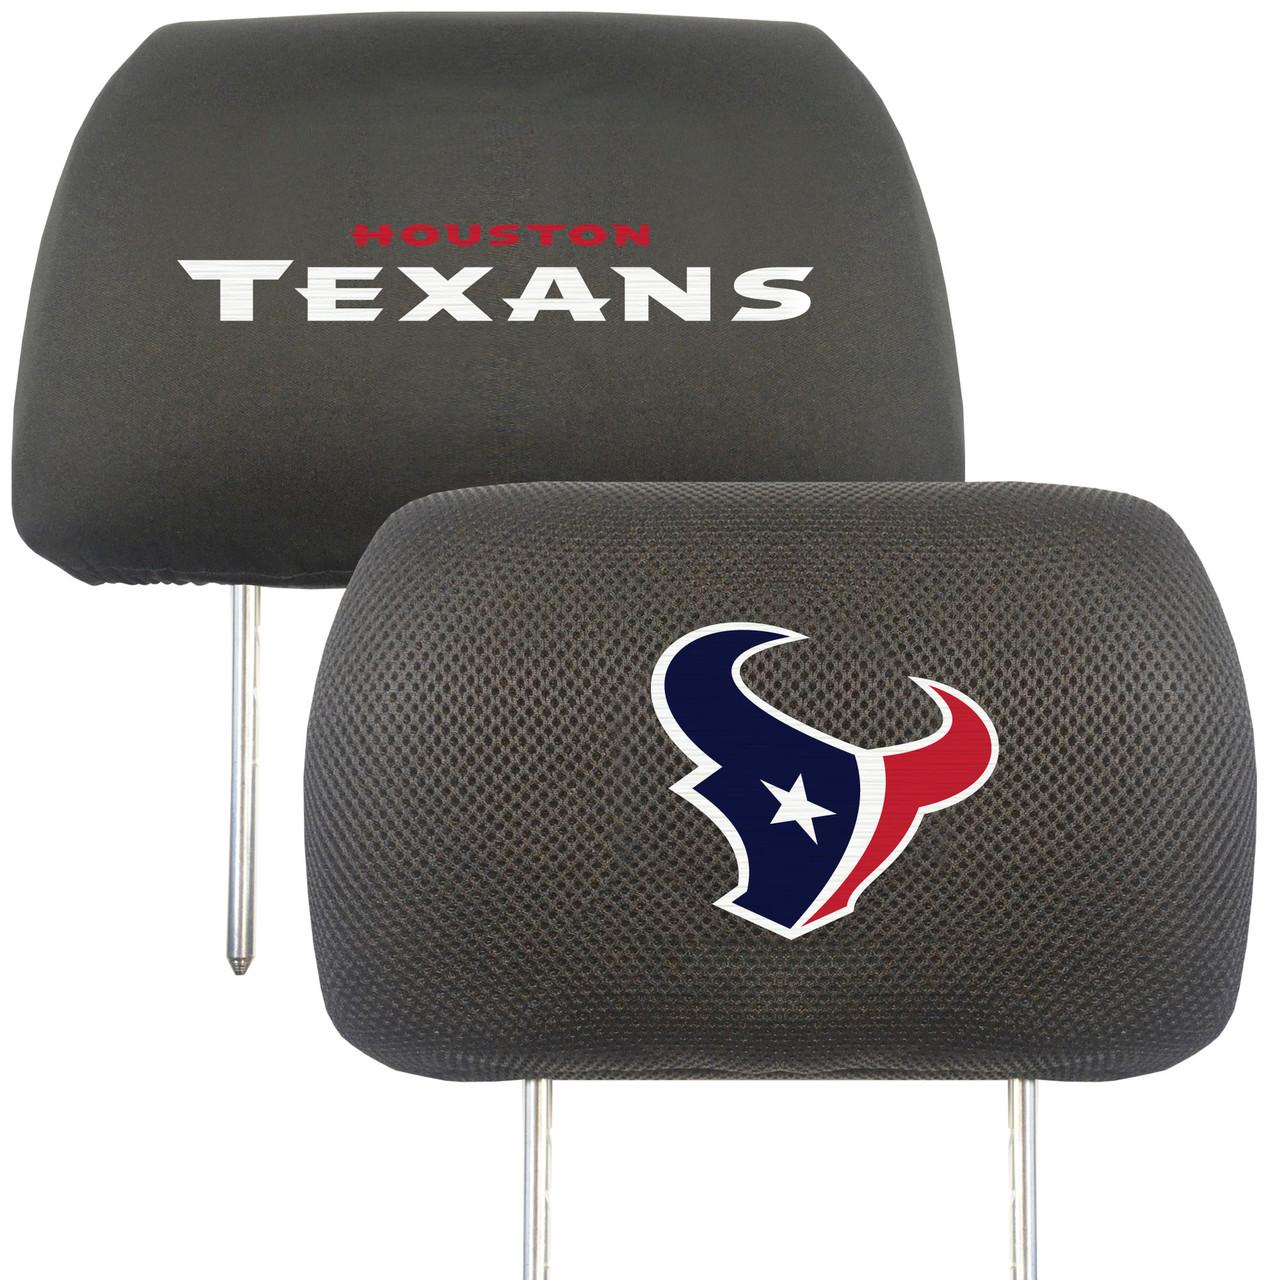 Houston Texans Headrest Covers FanMats